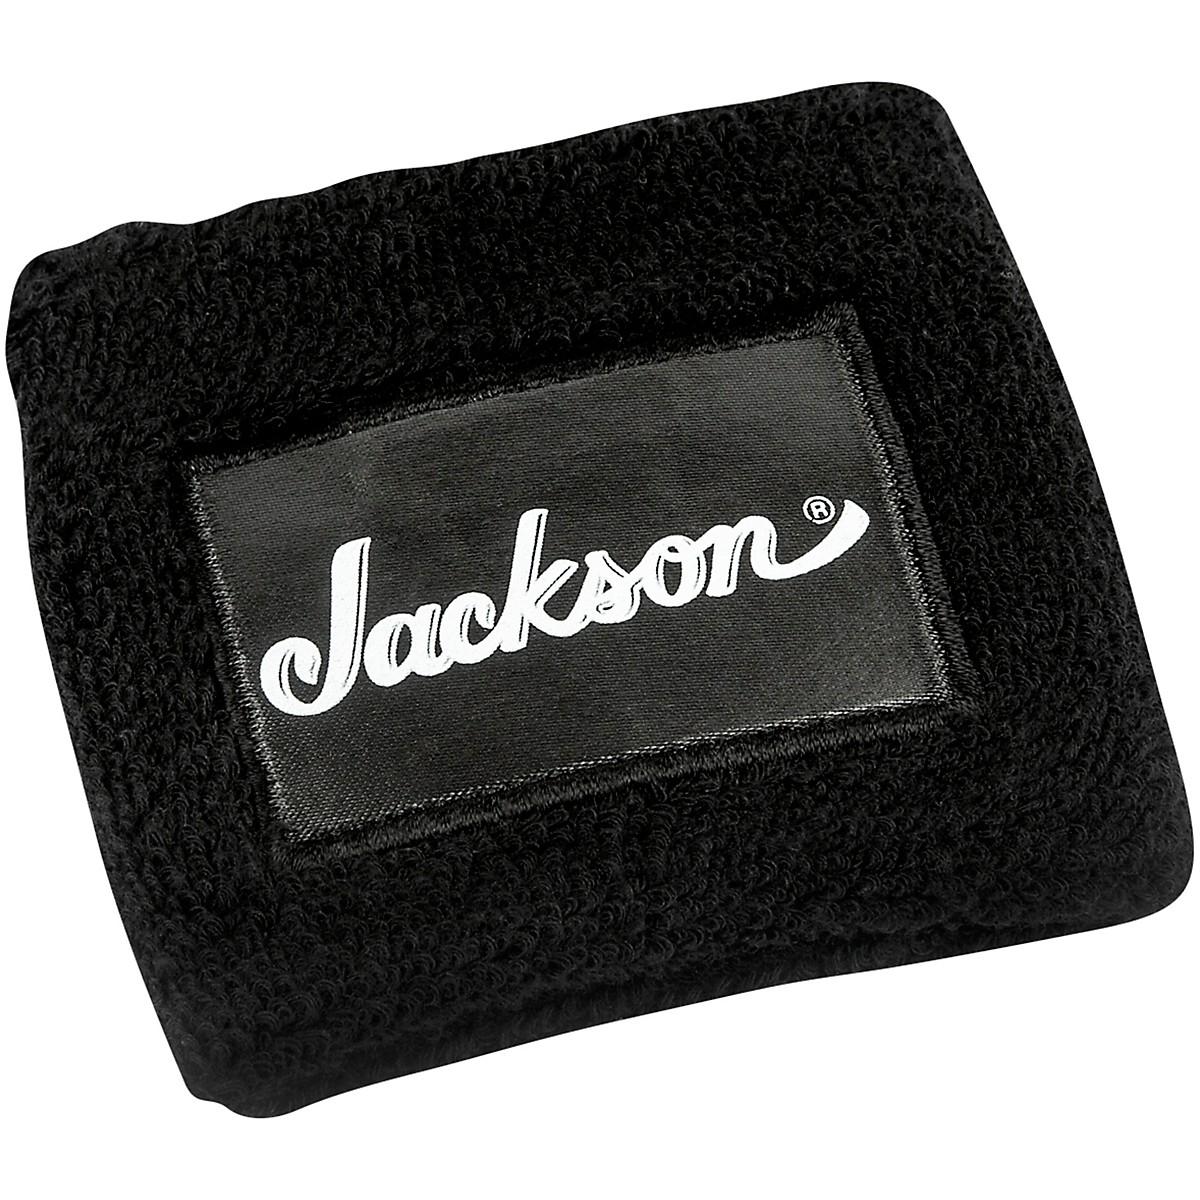 Jackson Logo Wristband - Black